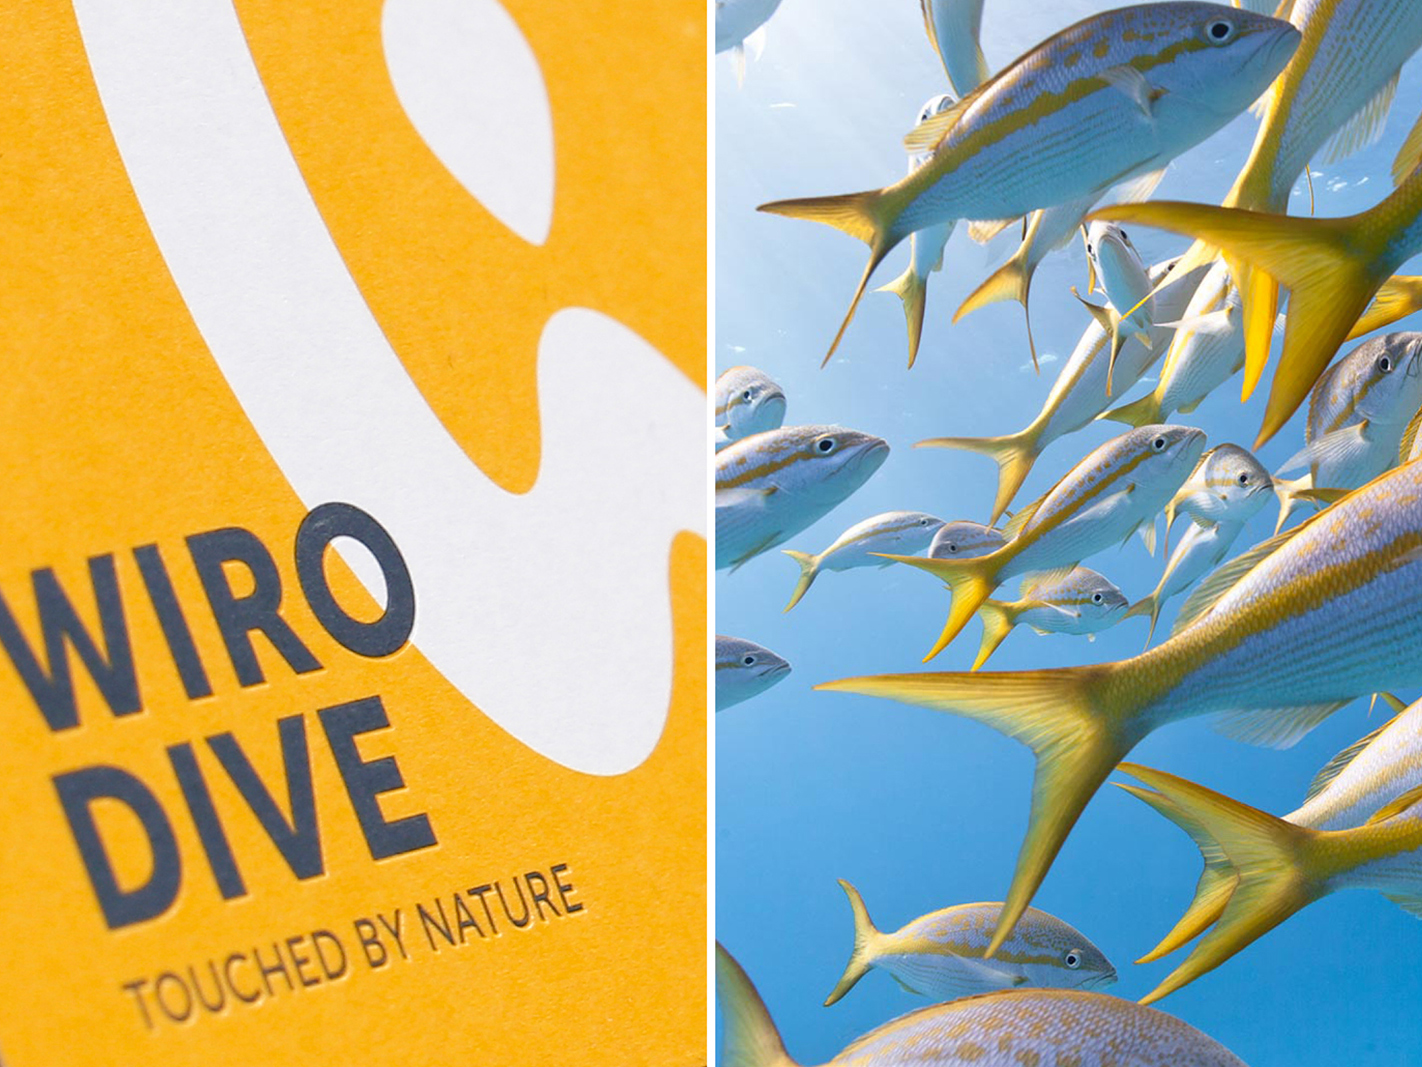 Corporate Design  Wiro Dive (Tauchreisen)